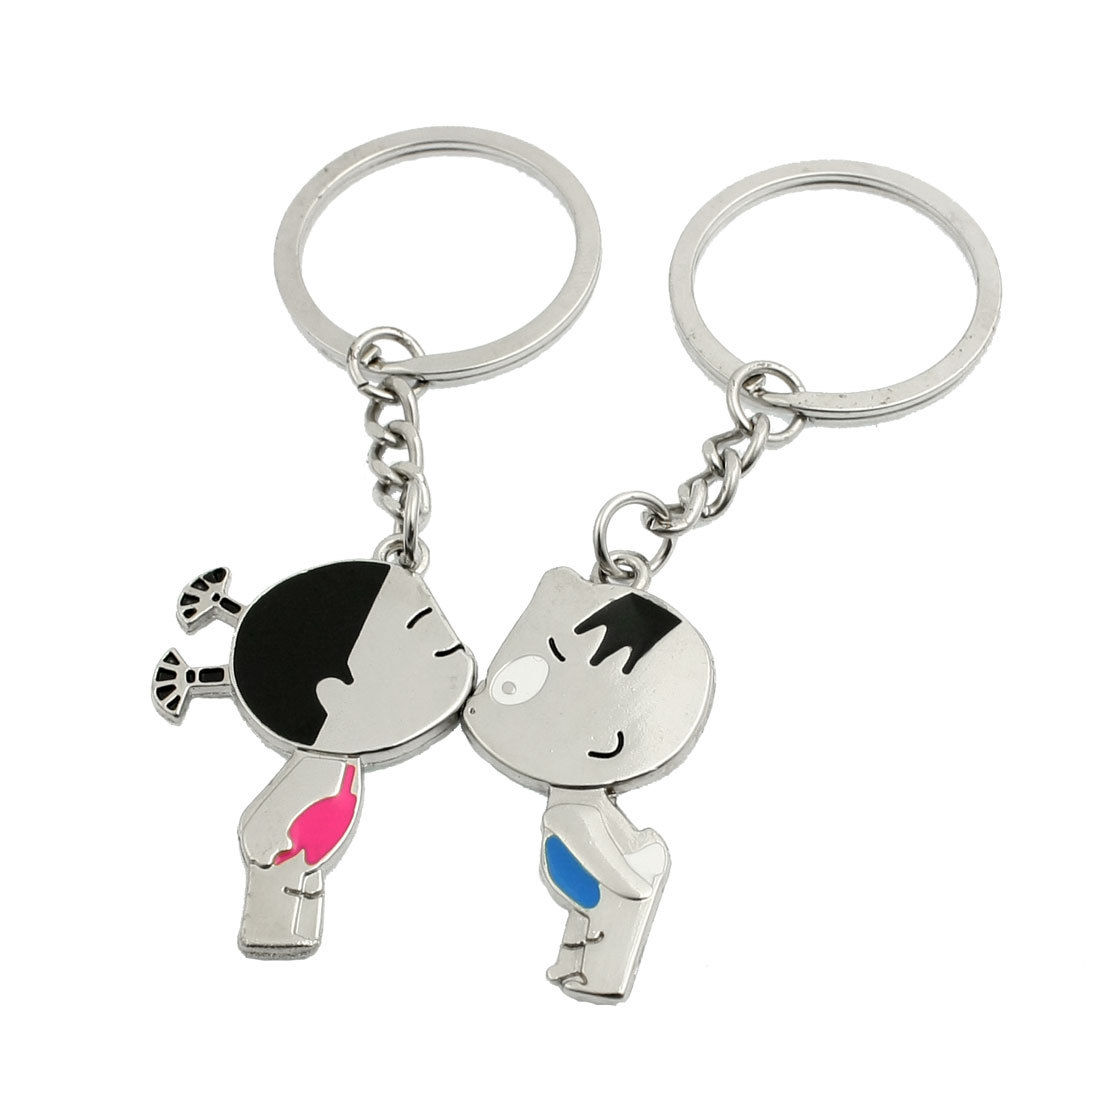 keychain shop cheap keychain from china keychain - HD1100×1100